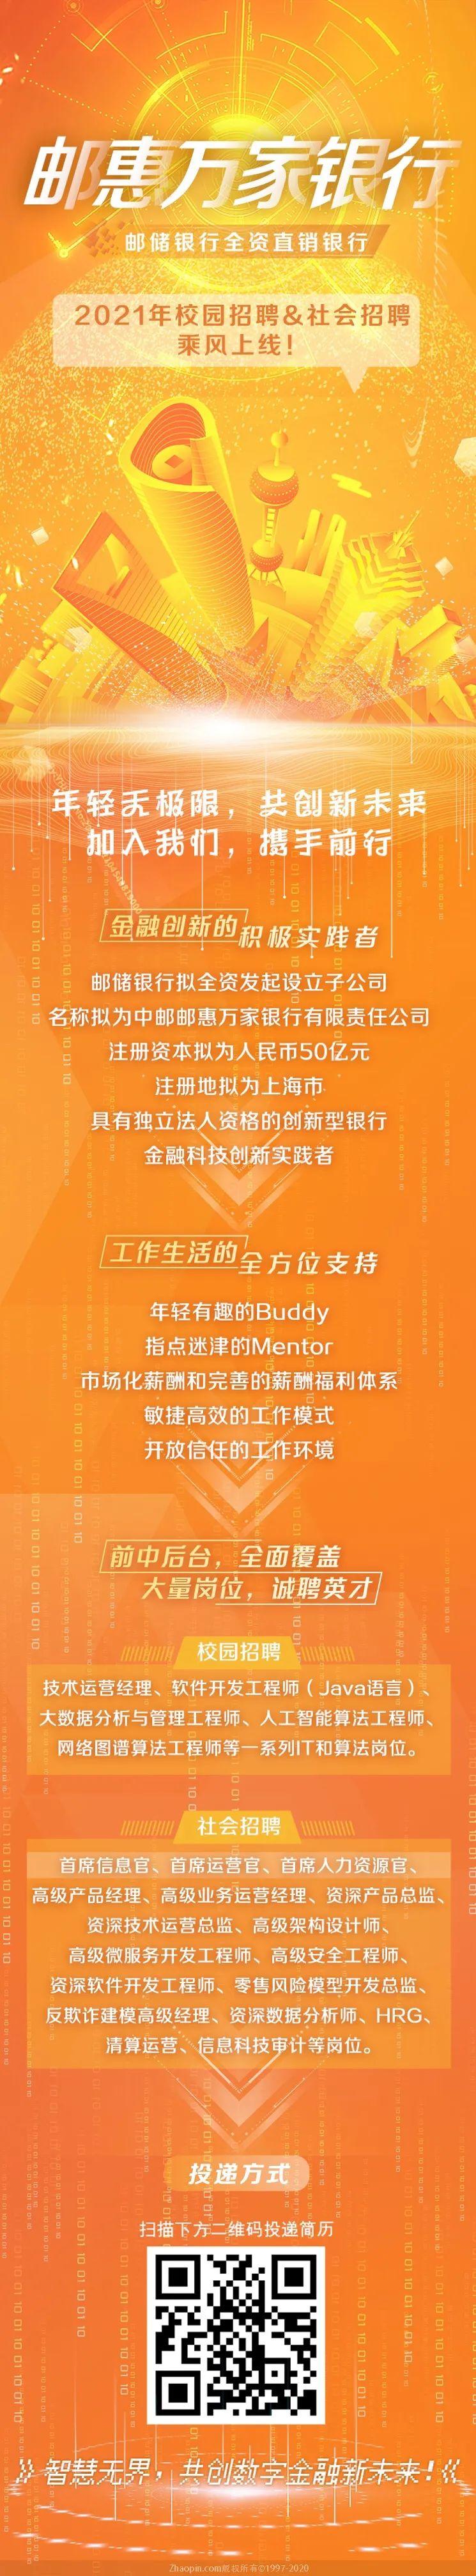 usdt自动充值(www.caibao.it):邮惠万家银行2021年校园招聘&社会招聘